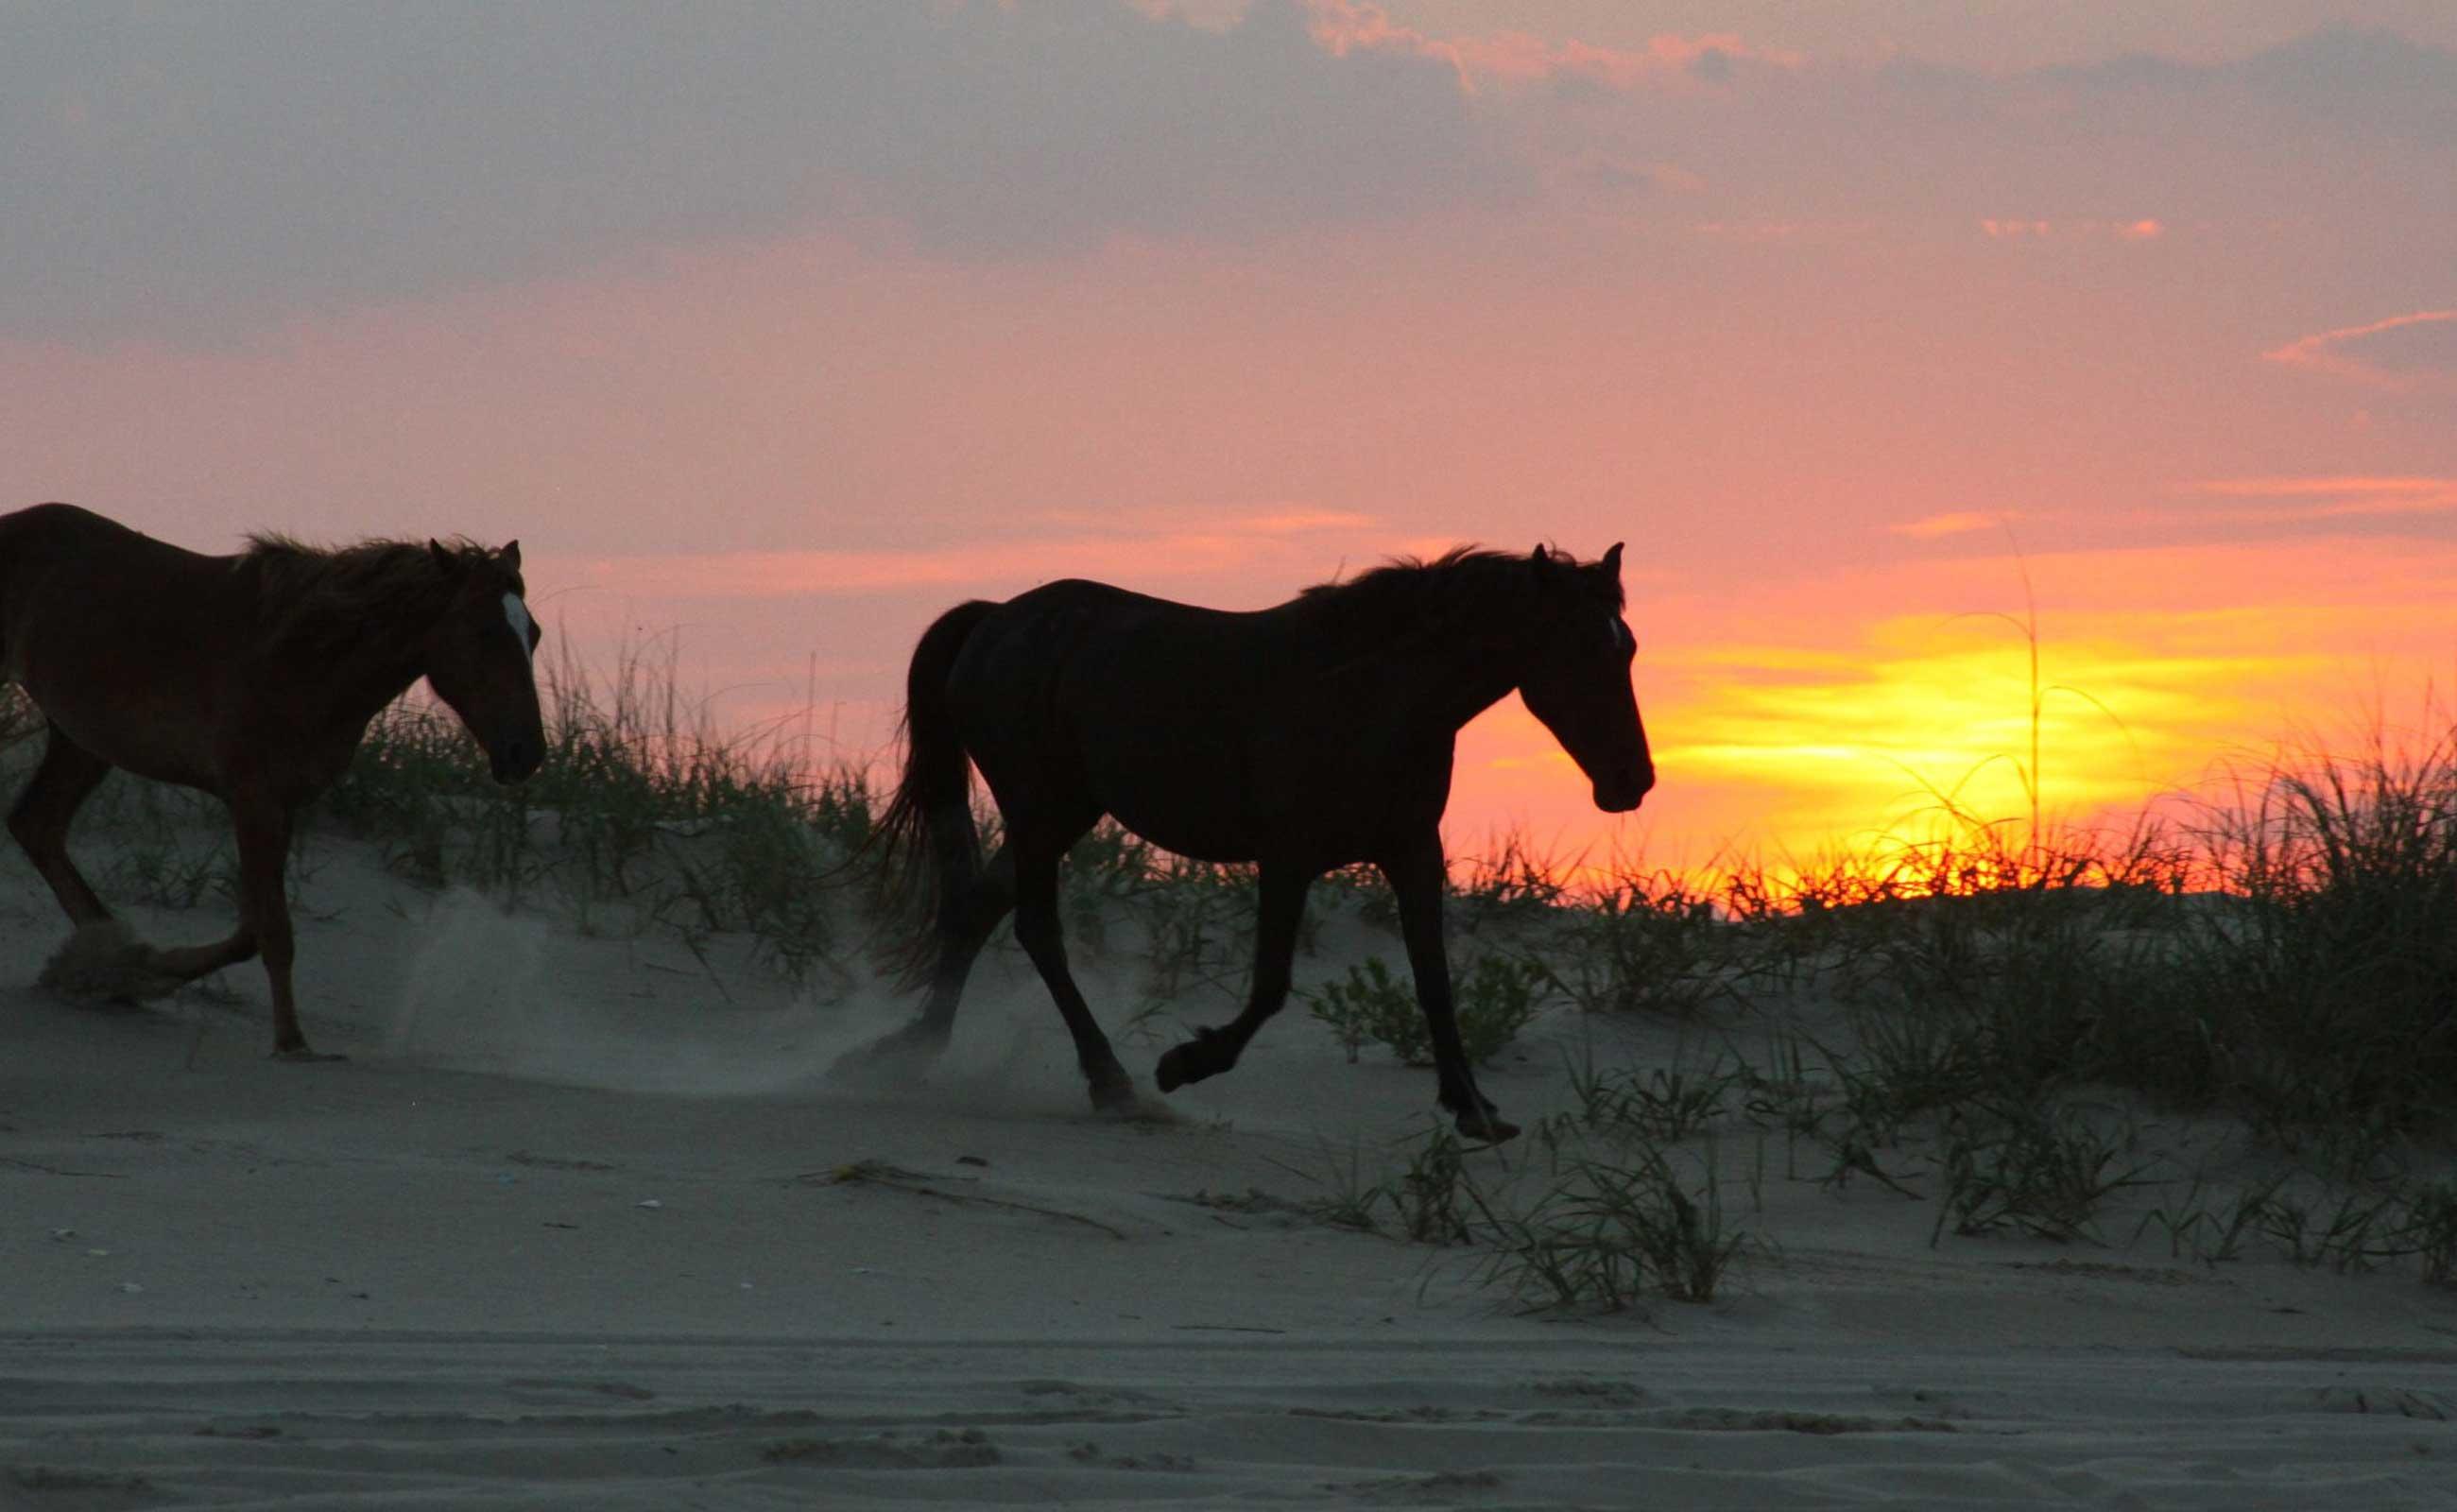 obx-ponies-sunset